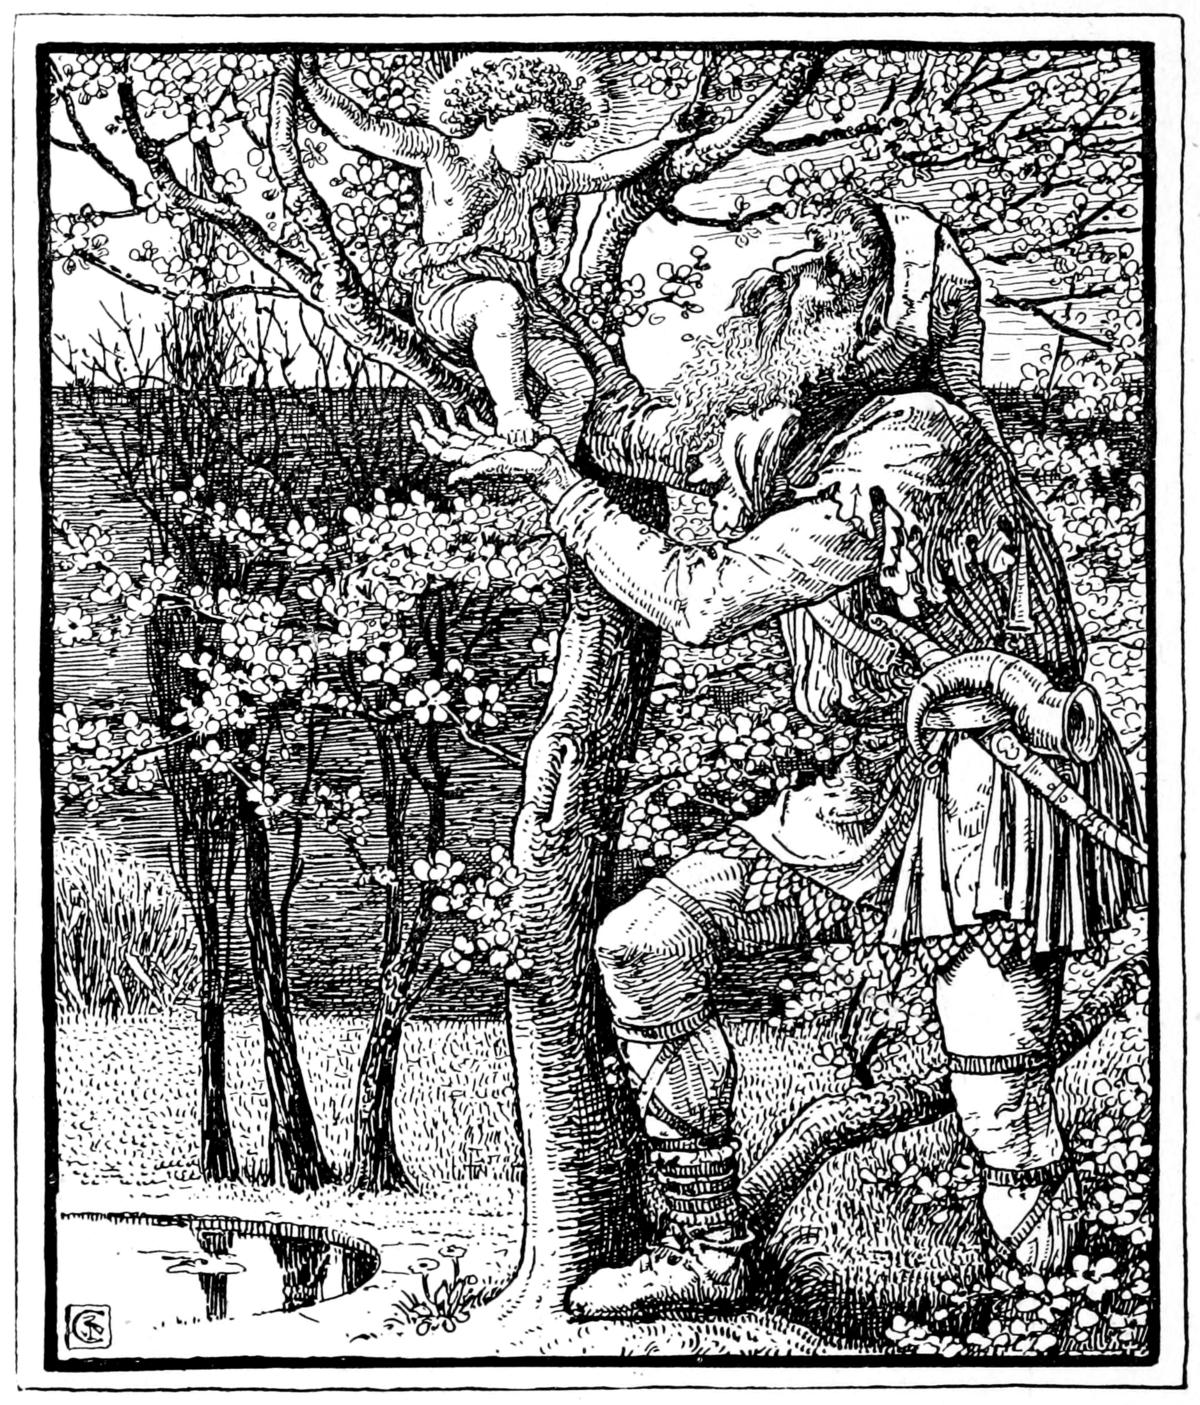 El gigante egoísta - Wikipedia, la enciclopedia libre